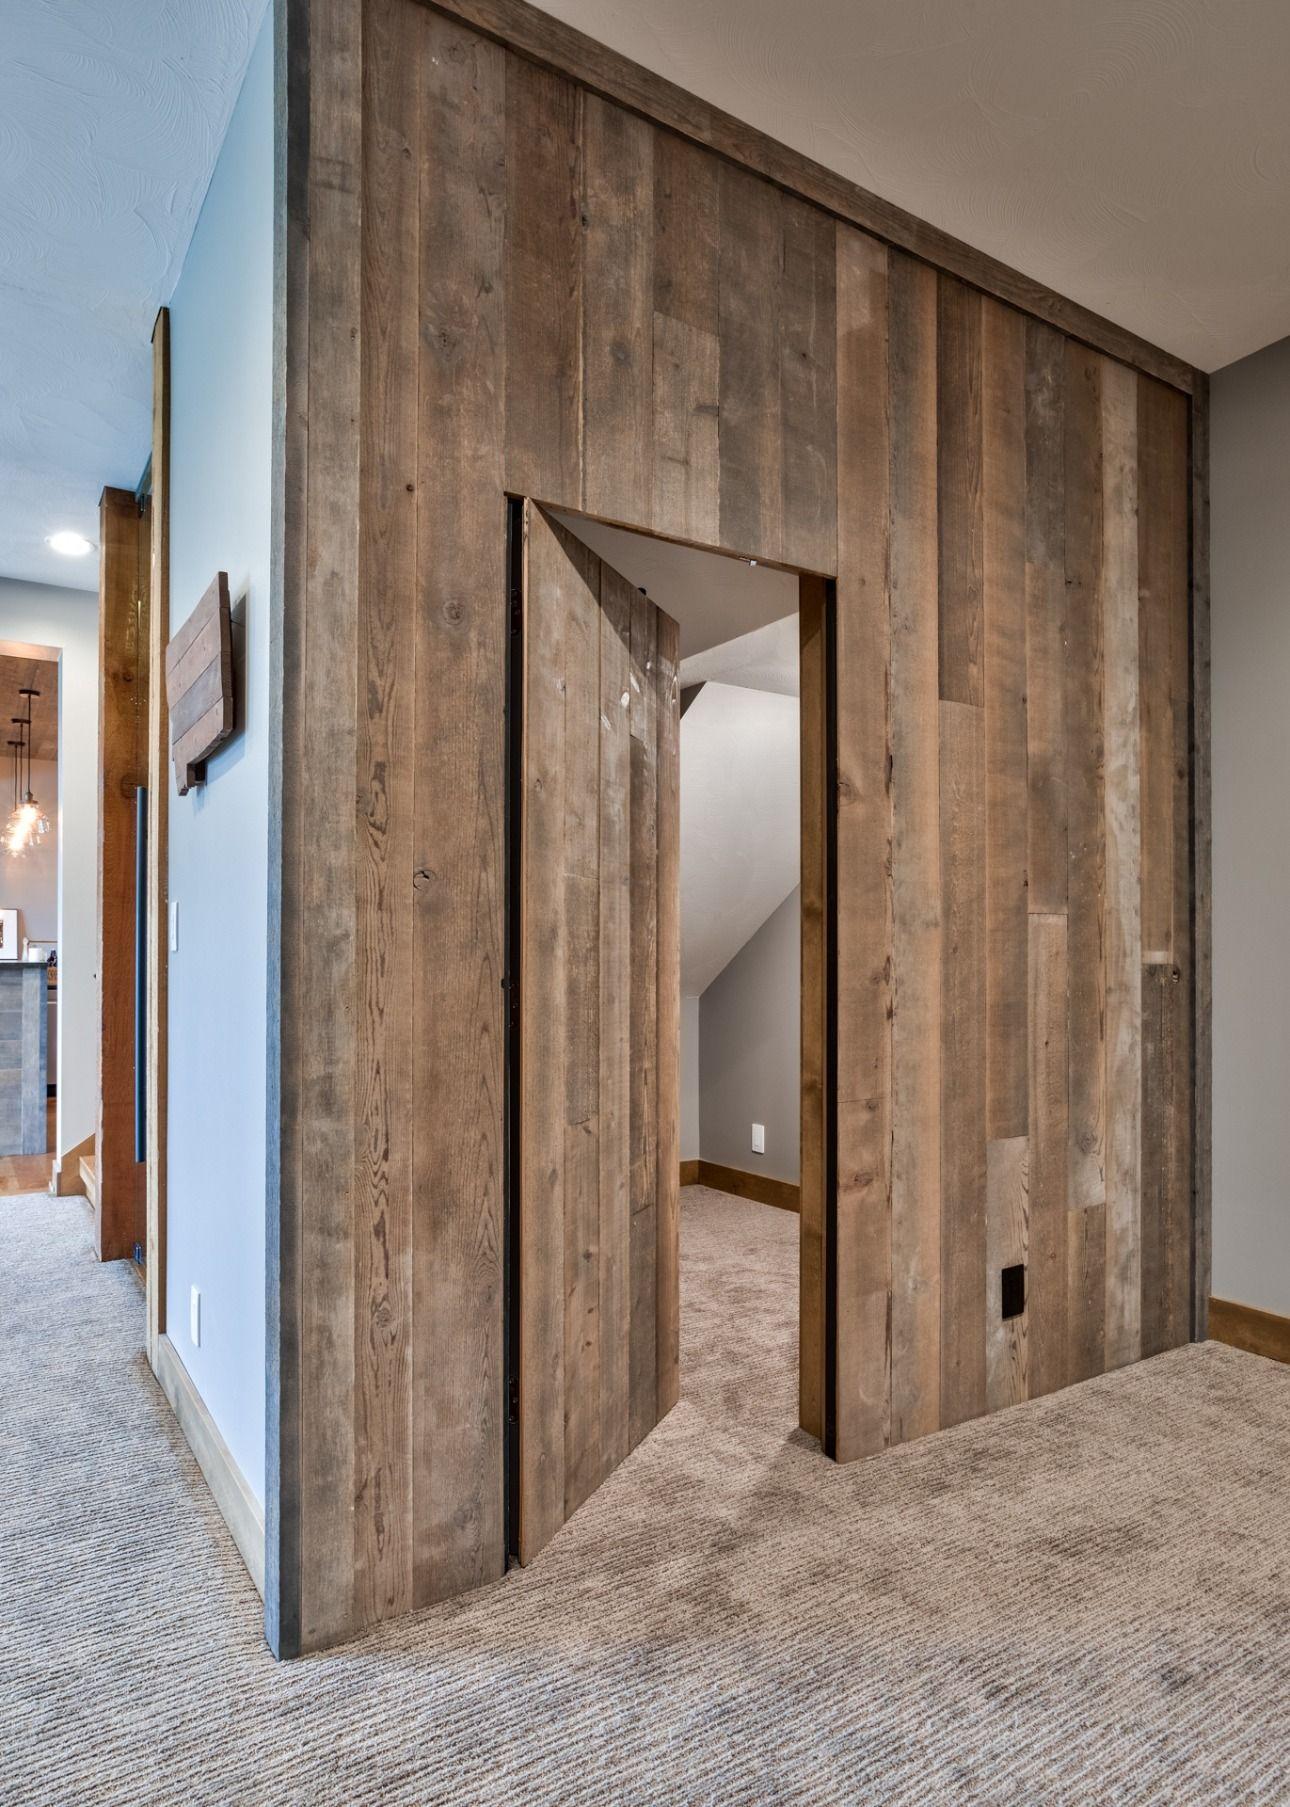 Interiors Cedar Walls Wood Siding Trim Reclaimed Wood Design